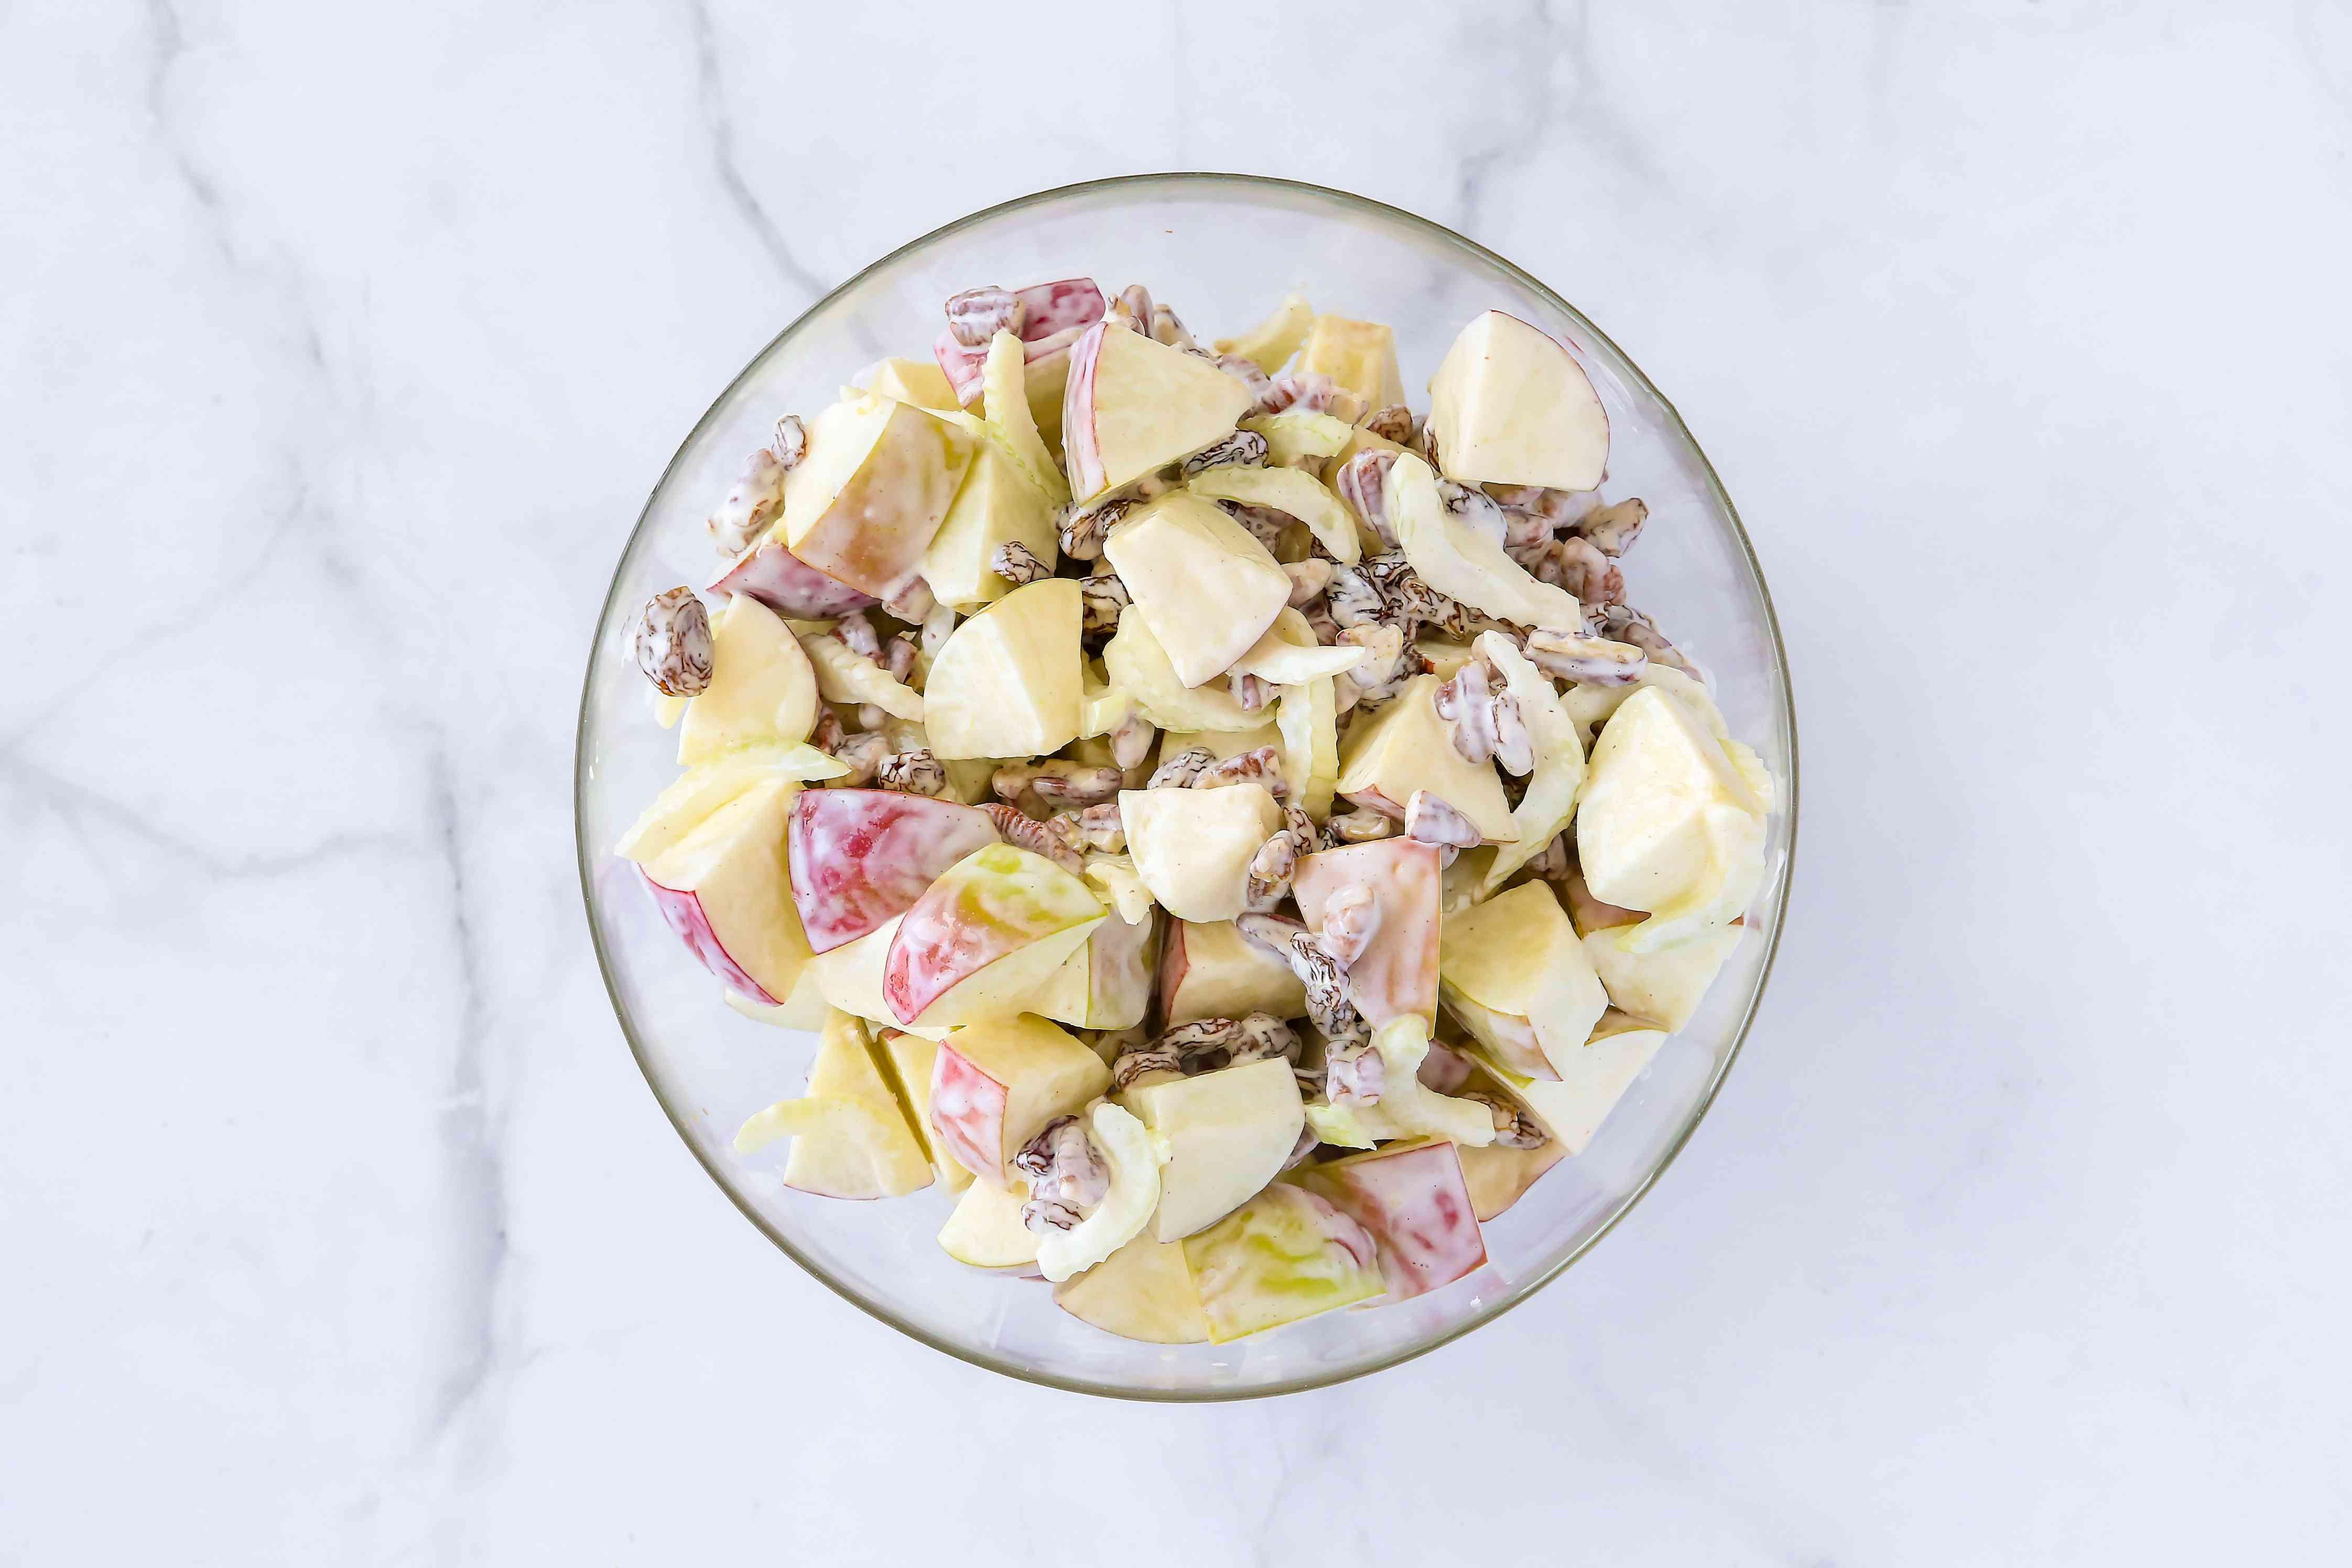 Apple salad ingredients in a bowl